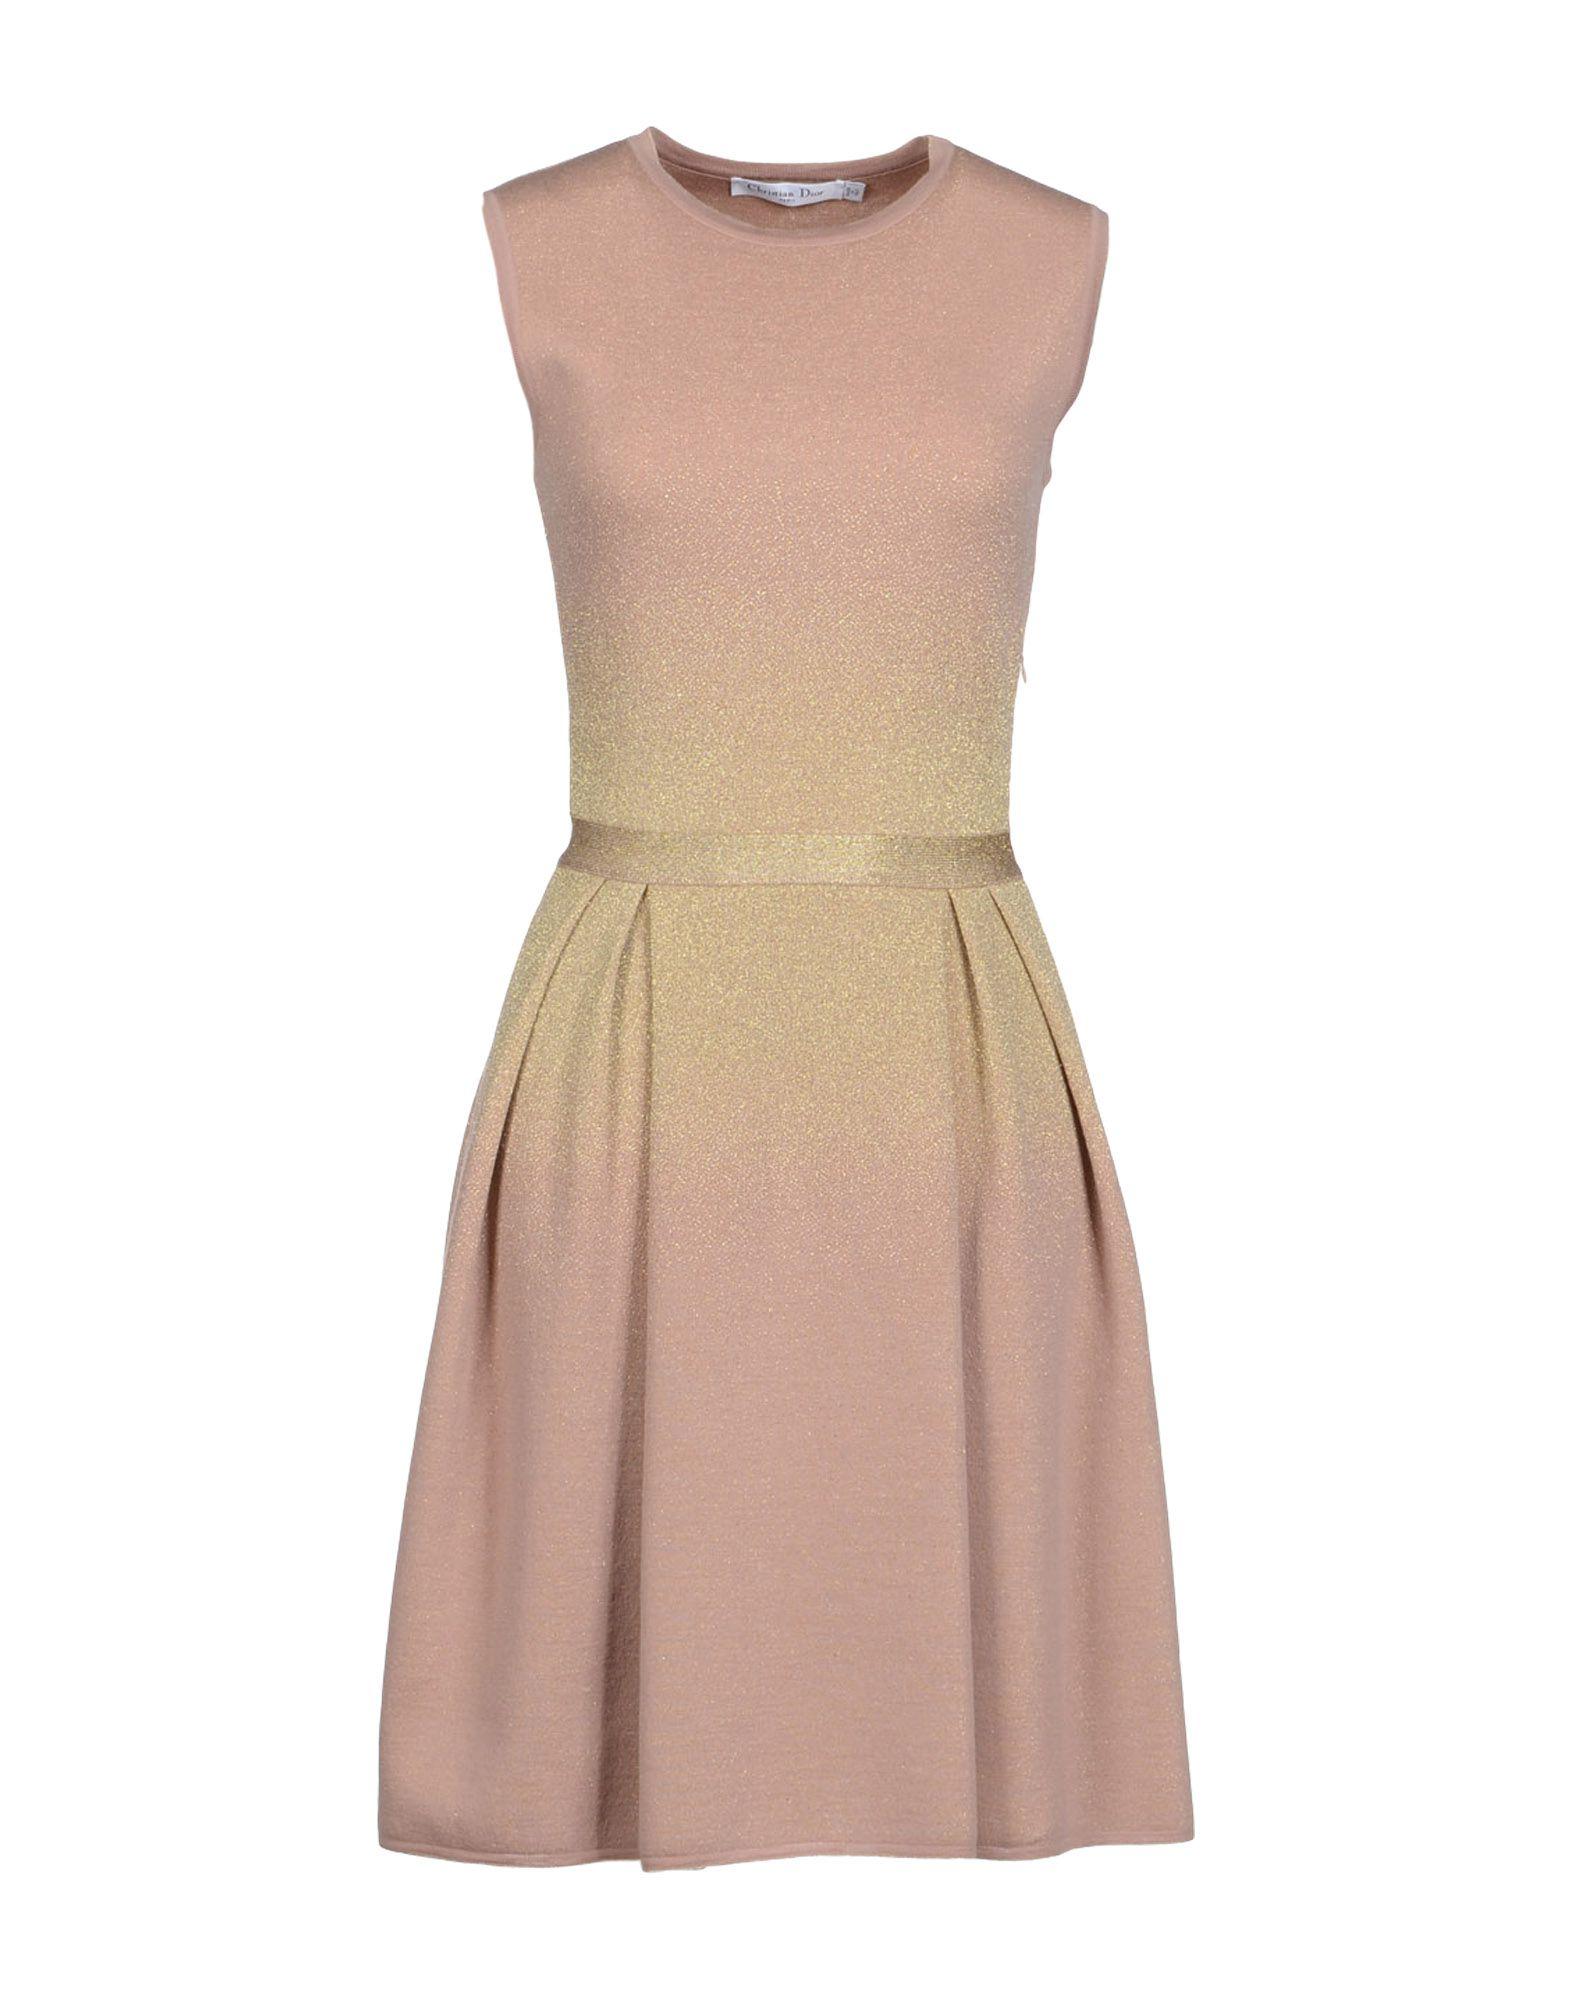 dior short dresses - photo #46